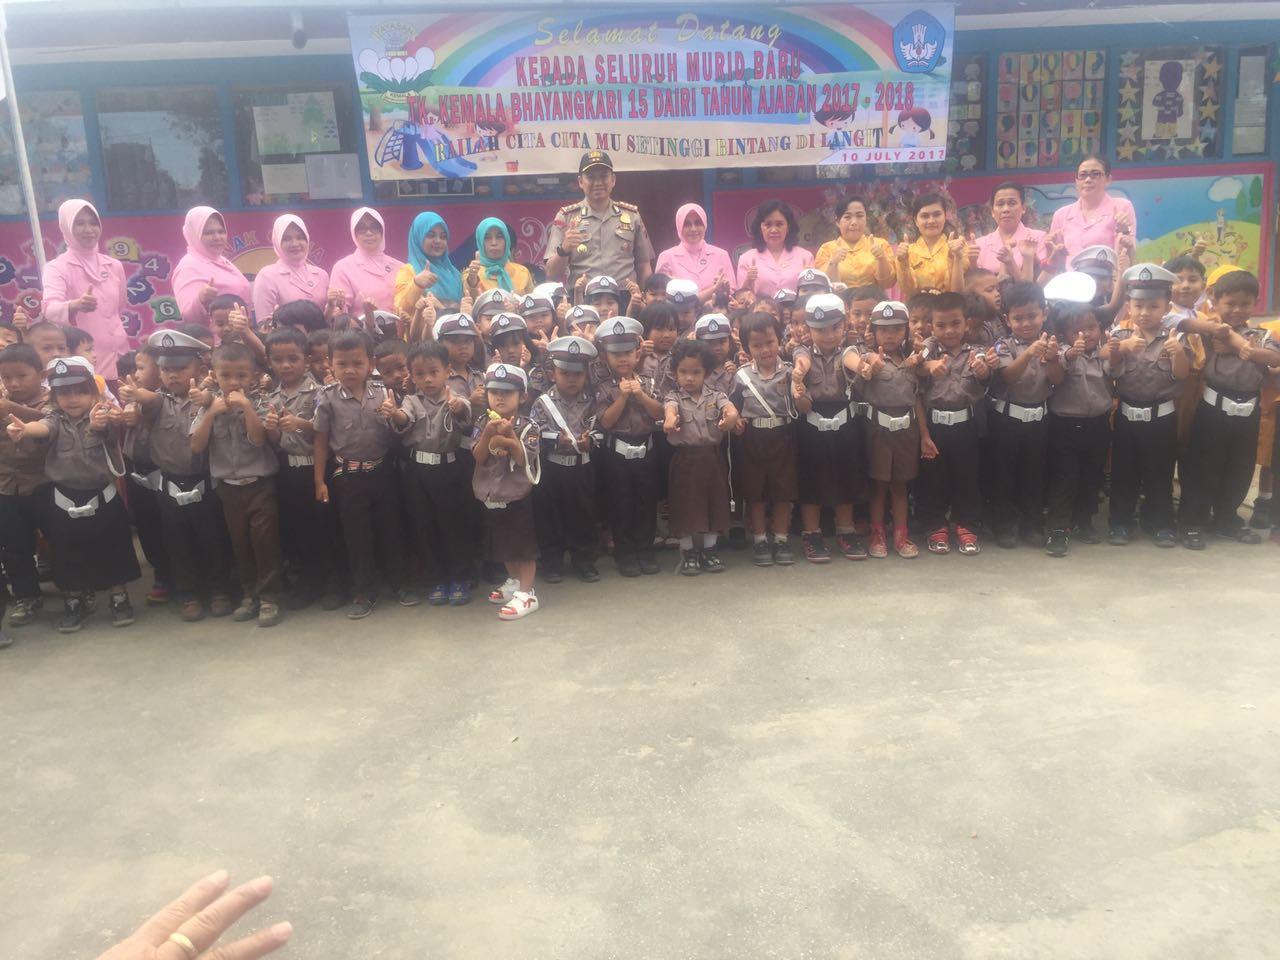 Kapolres Dairi dan Ketua Bhayangkari sambut murid baru TK Kemala Bhayangkari